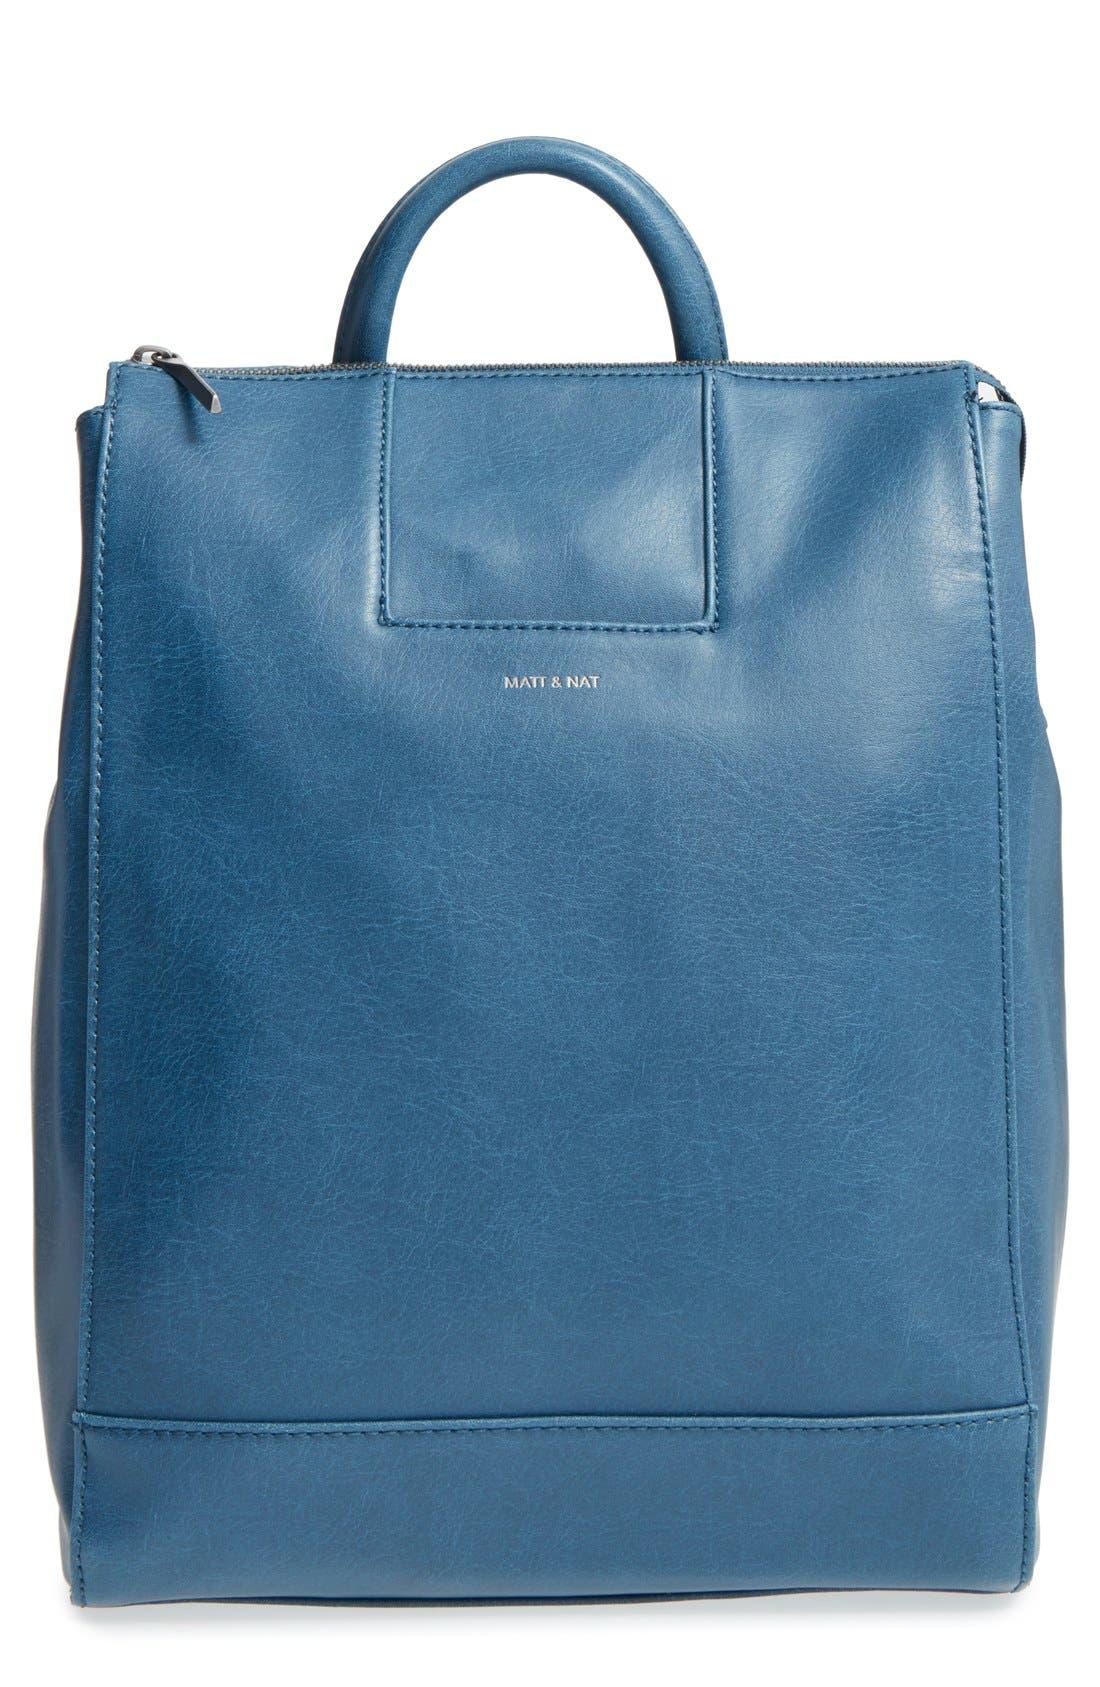 Alternate Image 1 Selected - Matt & Nat 'Katherine' Faux Leather Backpack